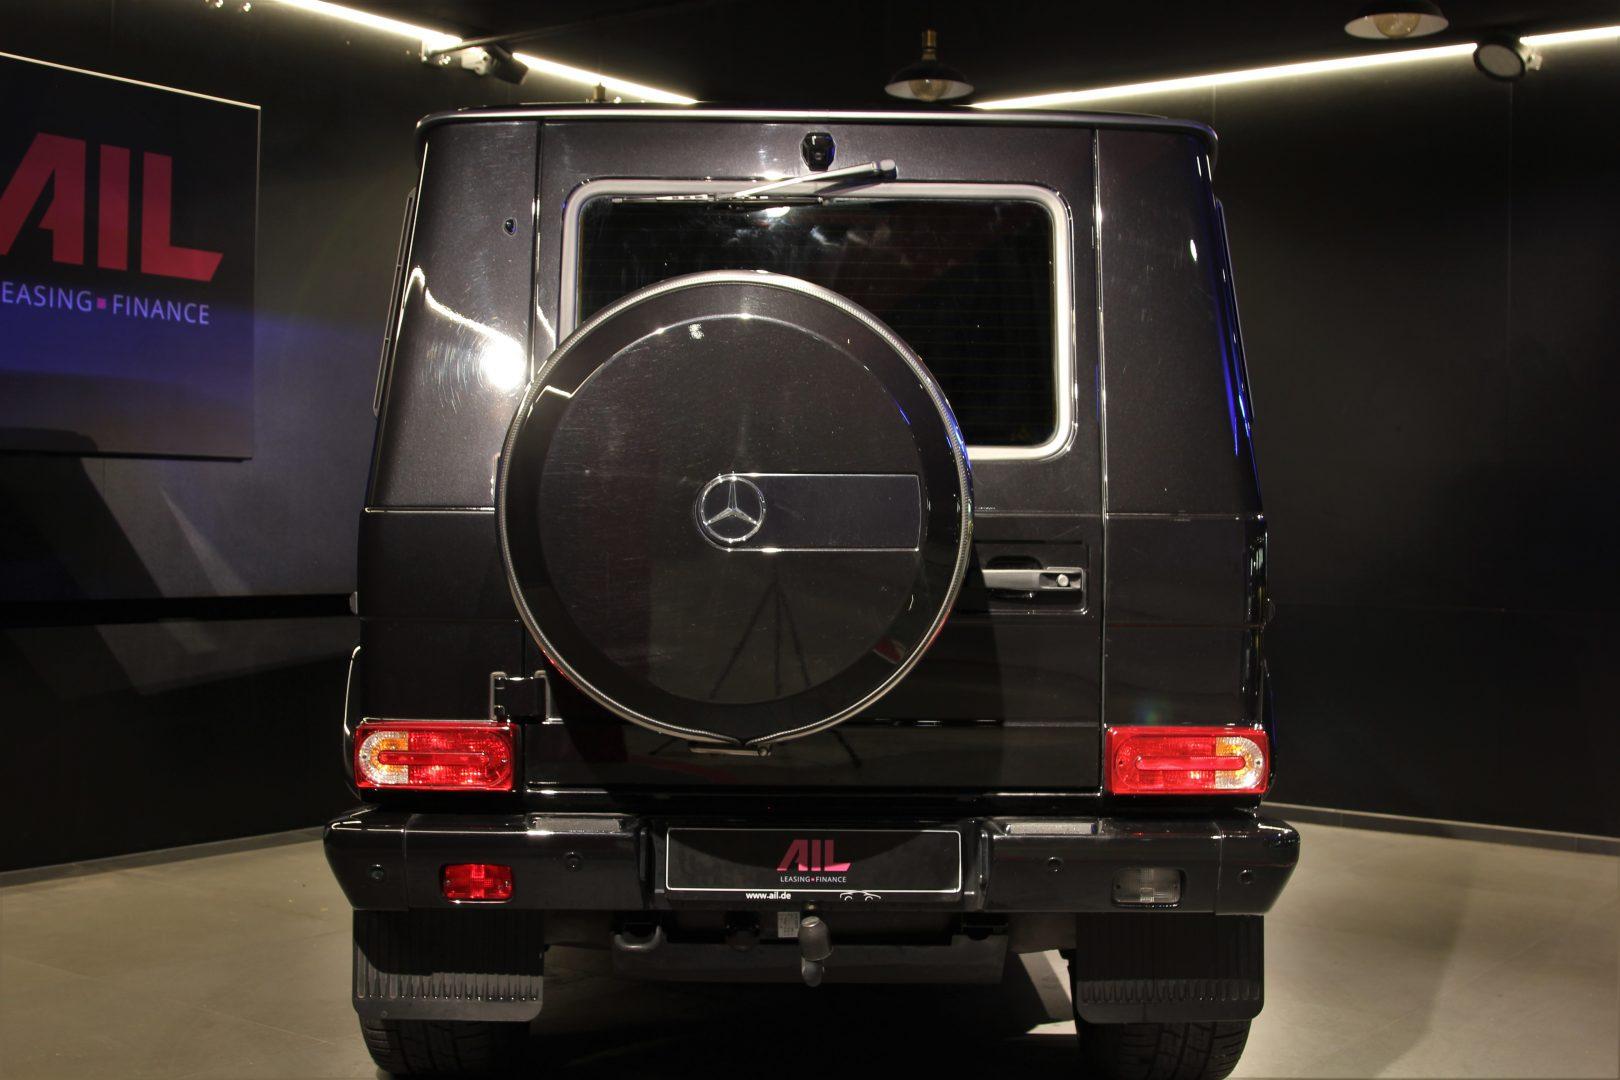 AIL Mercedes-Benz G 500 V8 Harman-Kardon Exklusiv Paket DAB 2